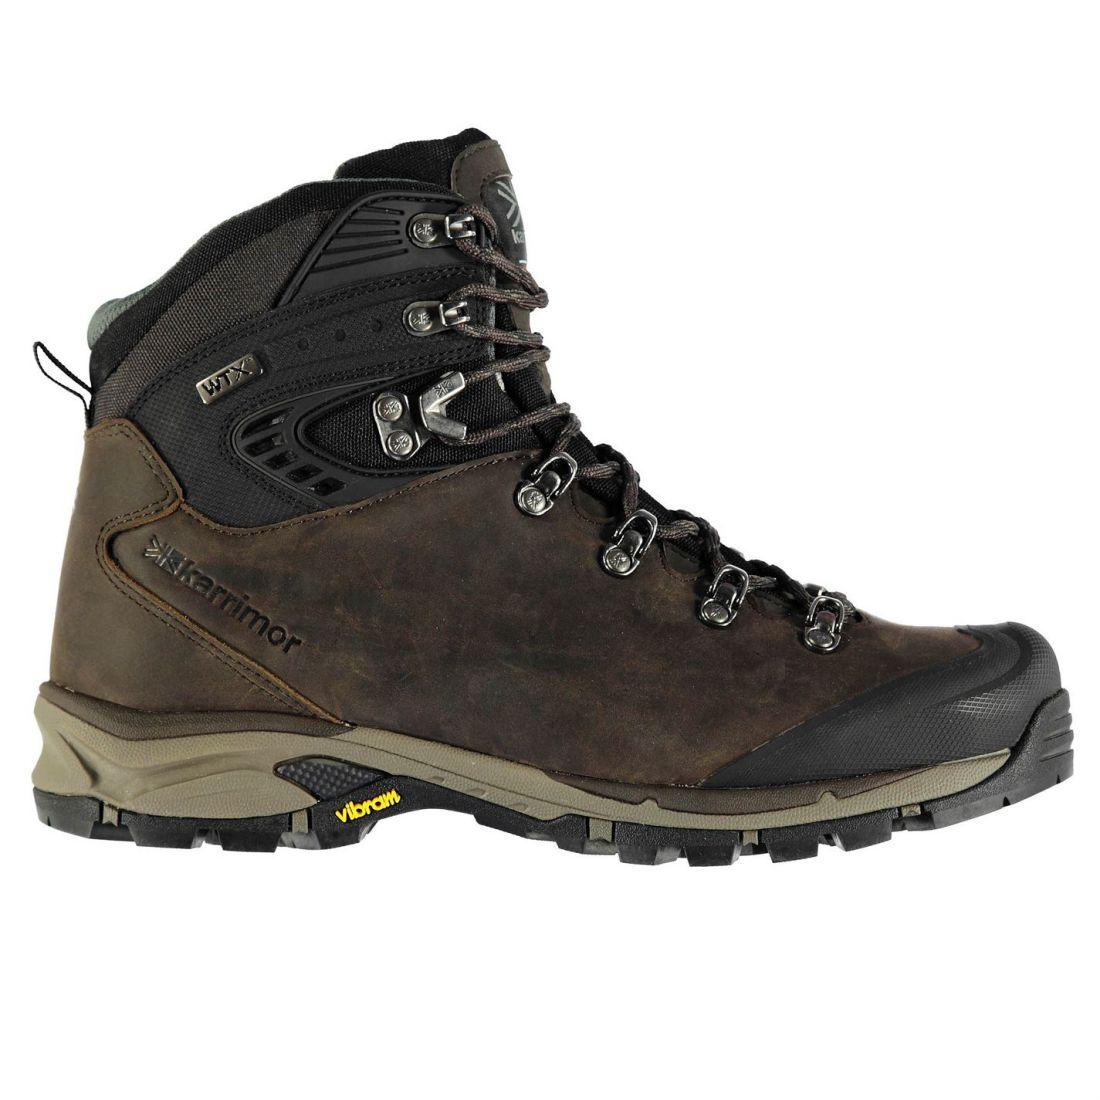 Karrimor botas al tobillo para hombre guepardo Vibram al aire libre caminar senderismo Trekking